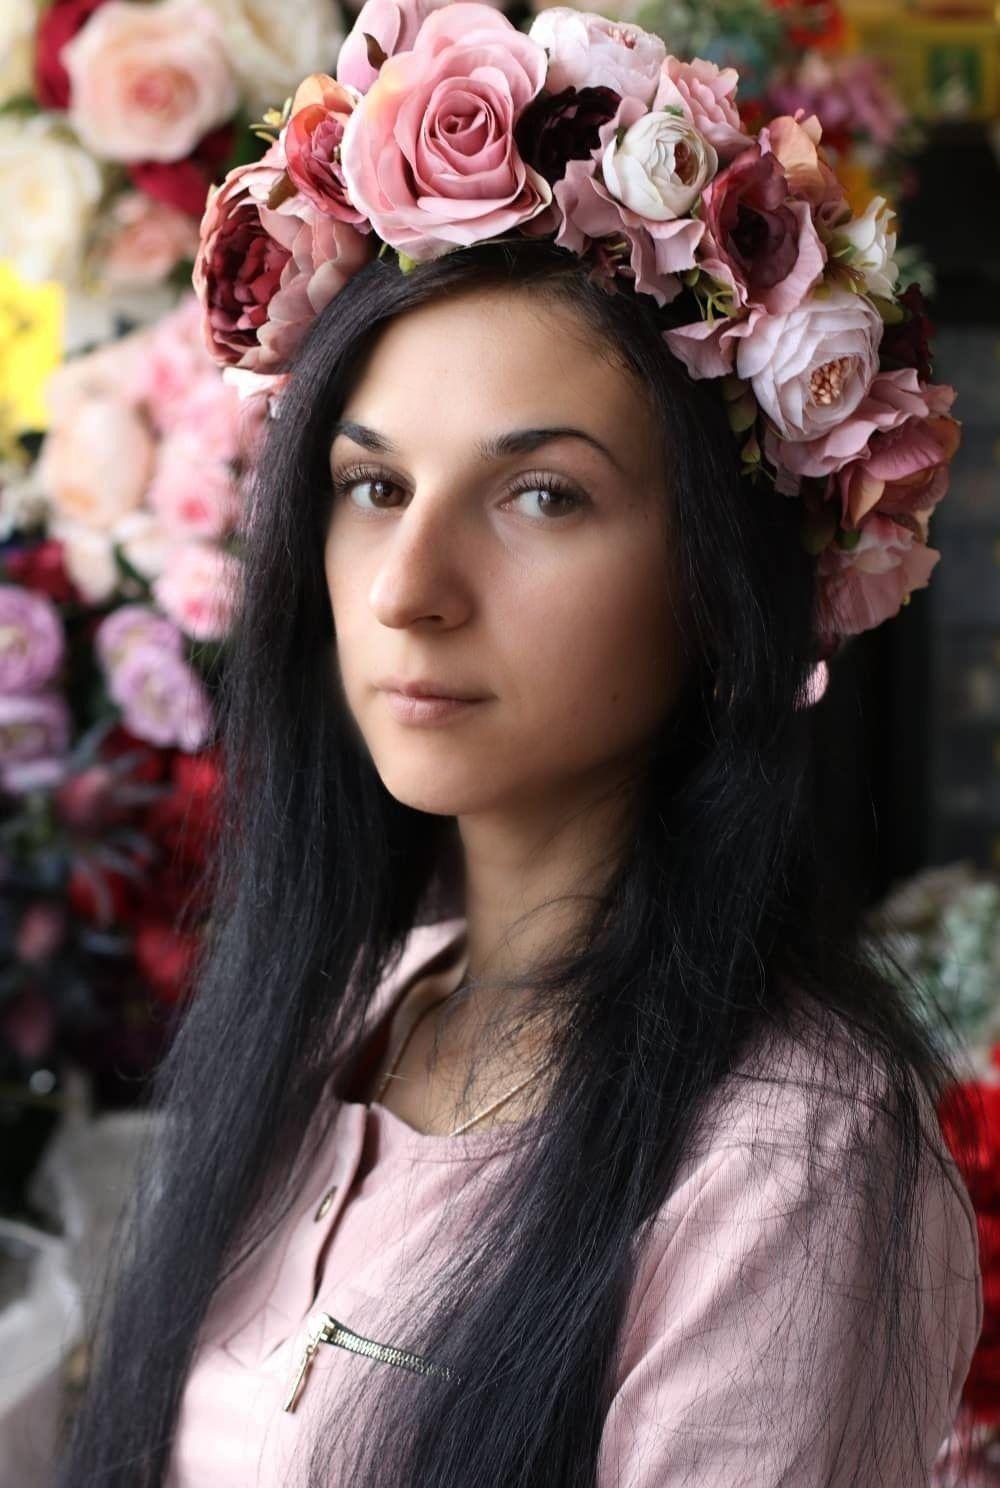 Burgundy bridesmaid dusty pink flower crown of roses and peonies